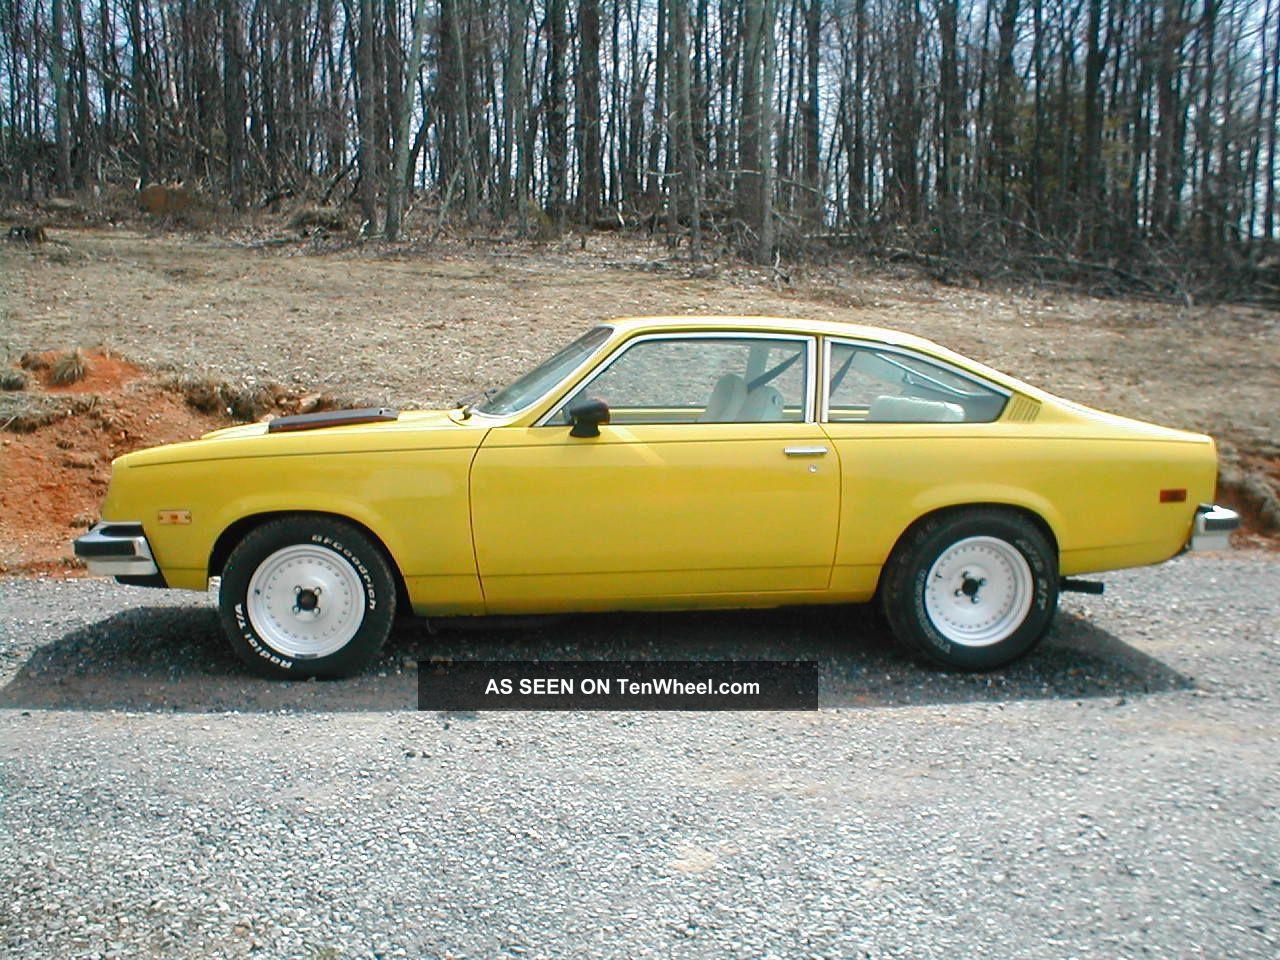 1975 Chevy Vega Street Legal V8 Auto Trans